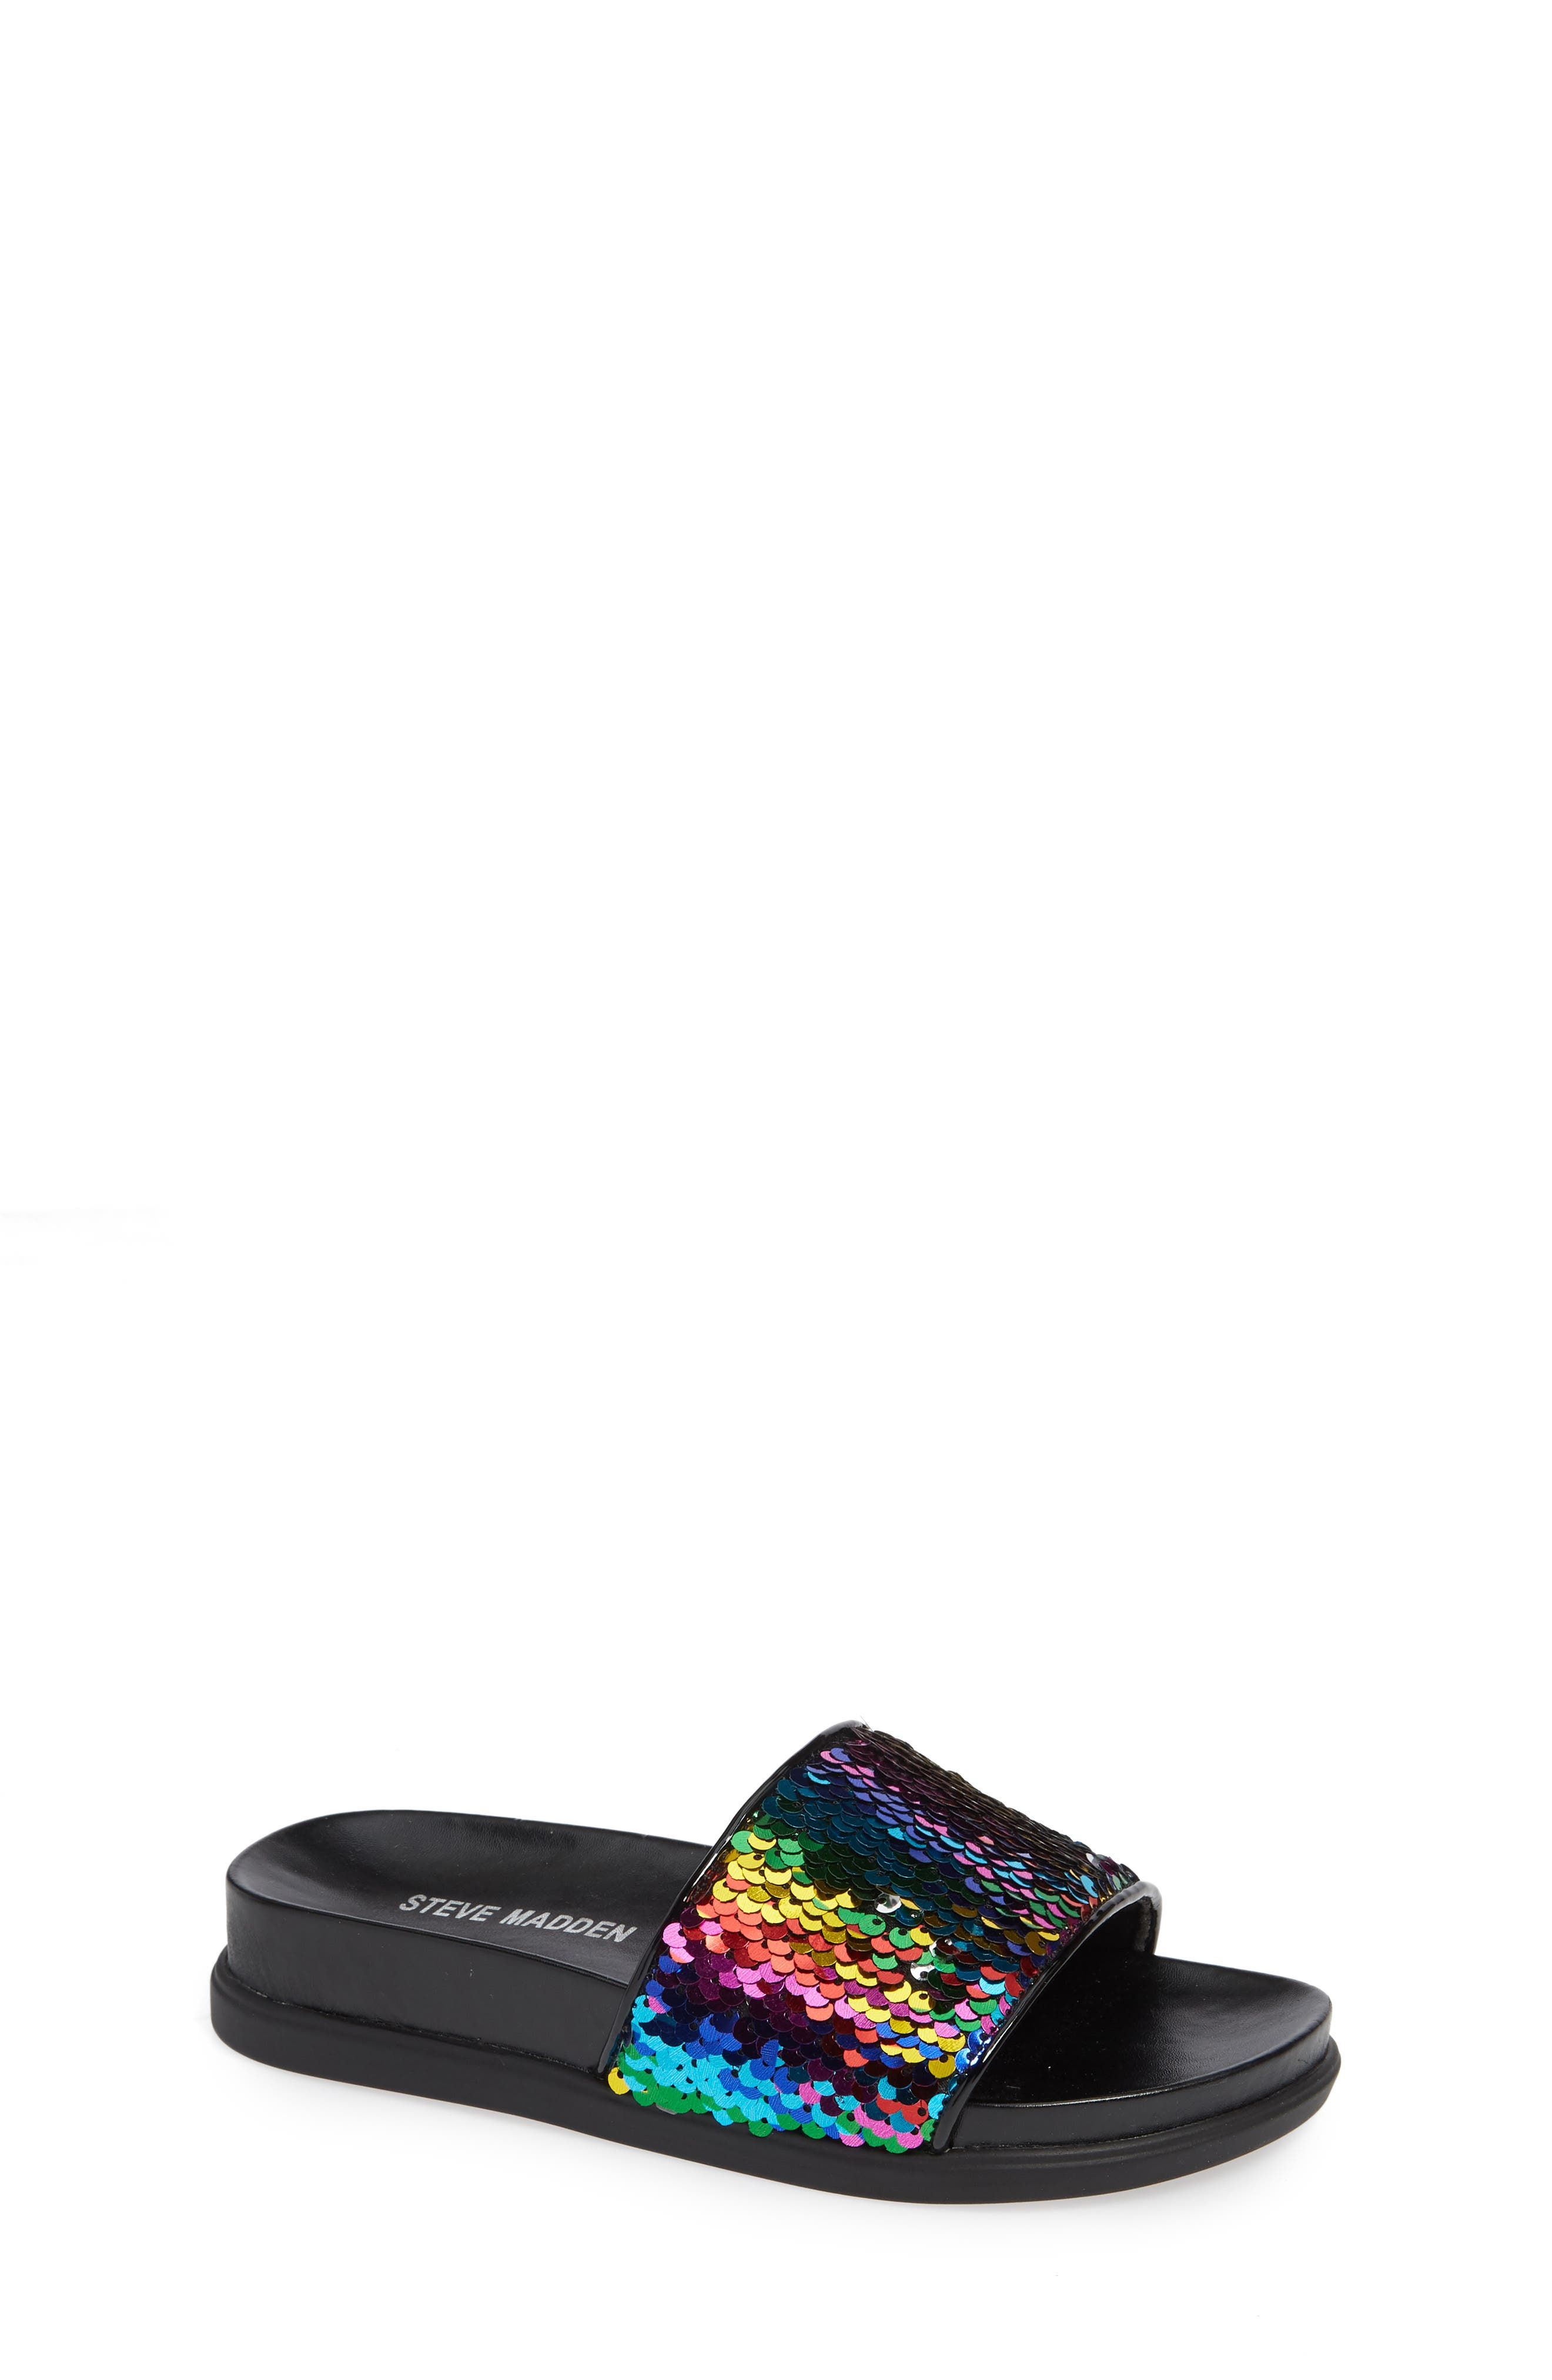 JFLIPS Slide Sandal,                             Main thumbnail 1, color,                             BLACK MULTI